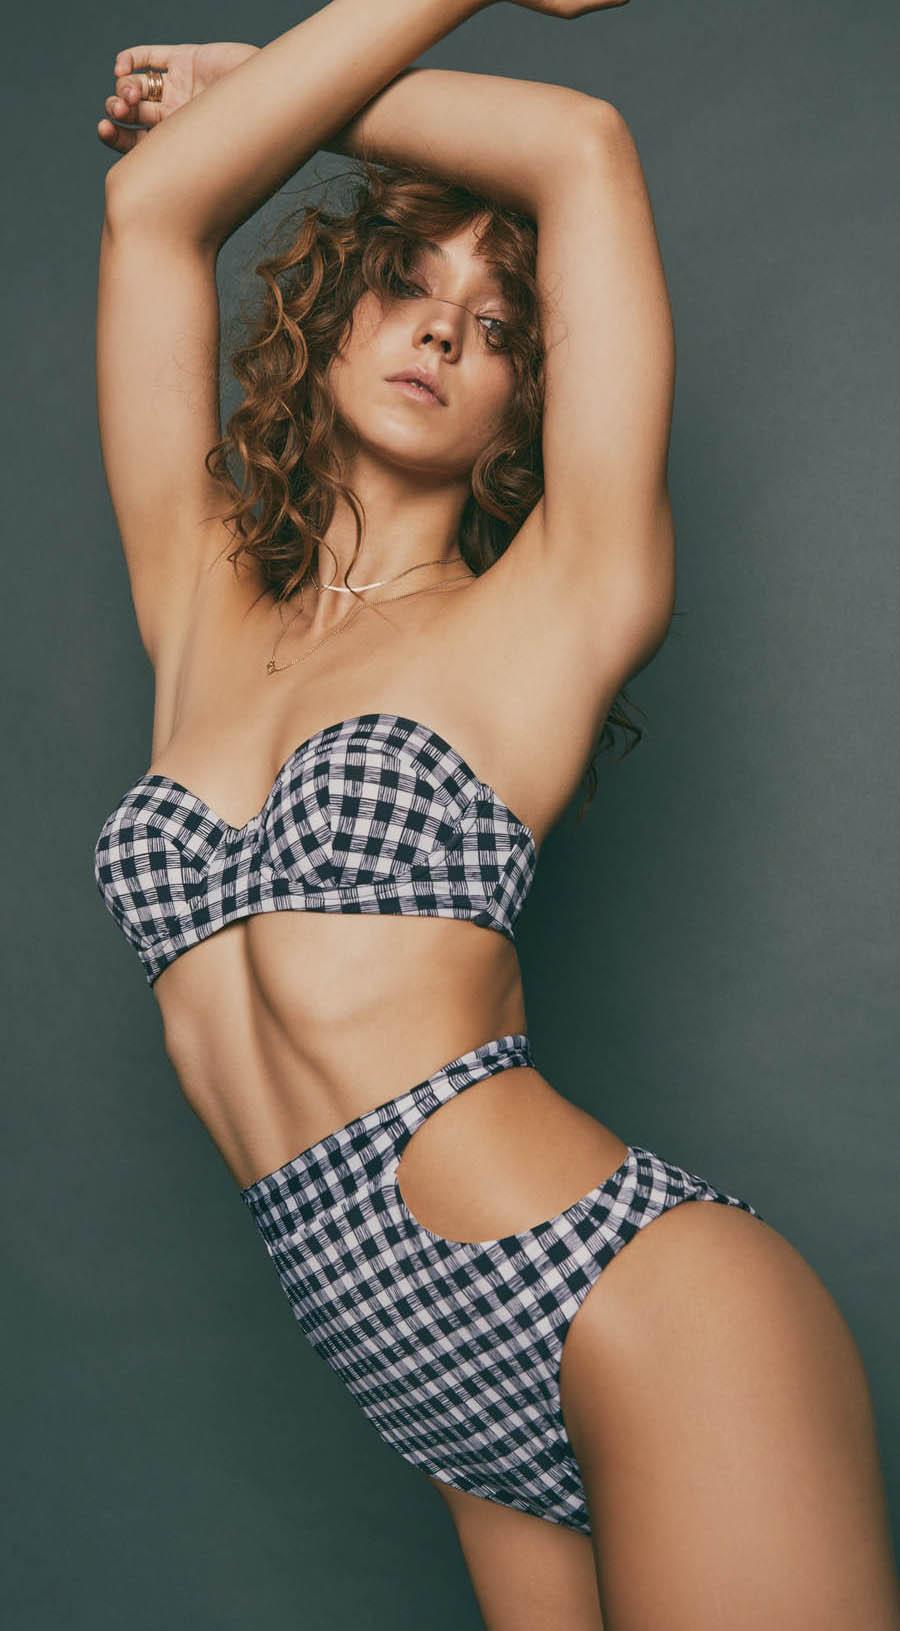 Audrina Patridge, Prey Swim Resort Wear Swimsuit Line, Celebrity Clothing Brand, Miaou Bustier Top, Bardot Bottoms